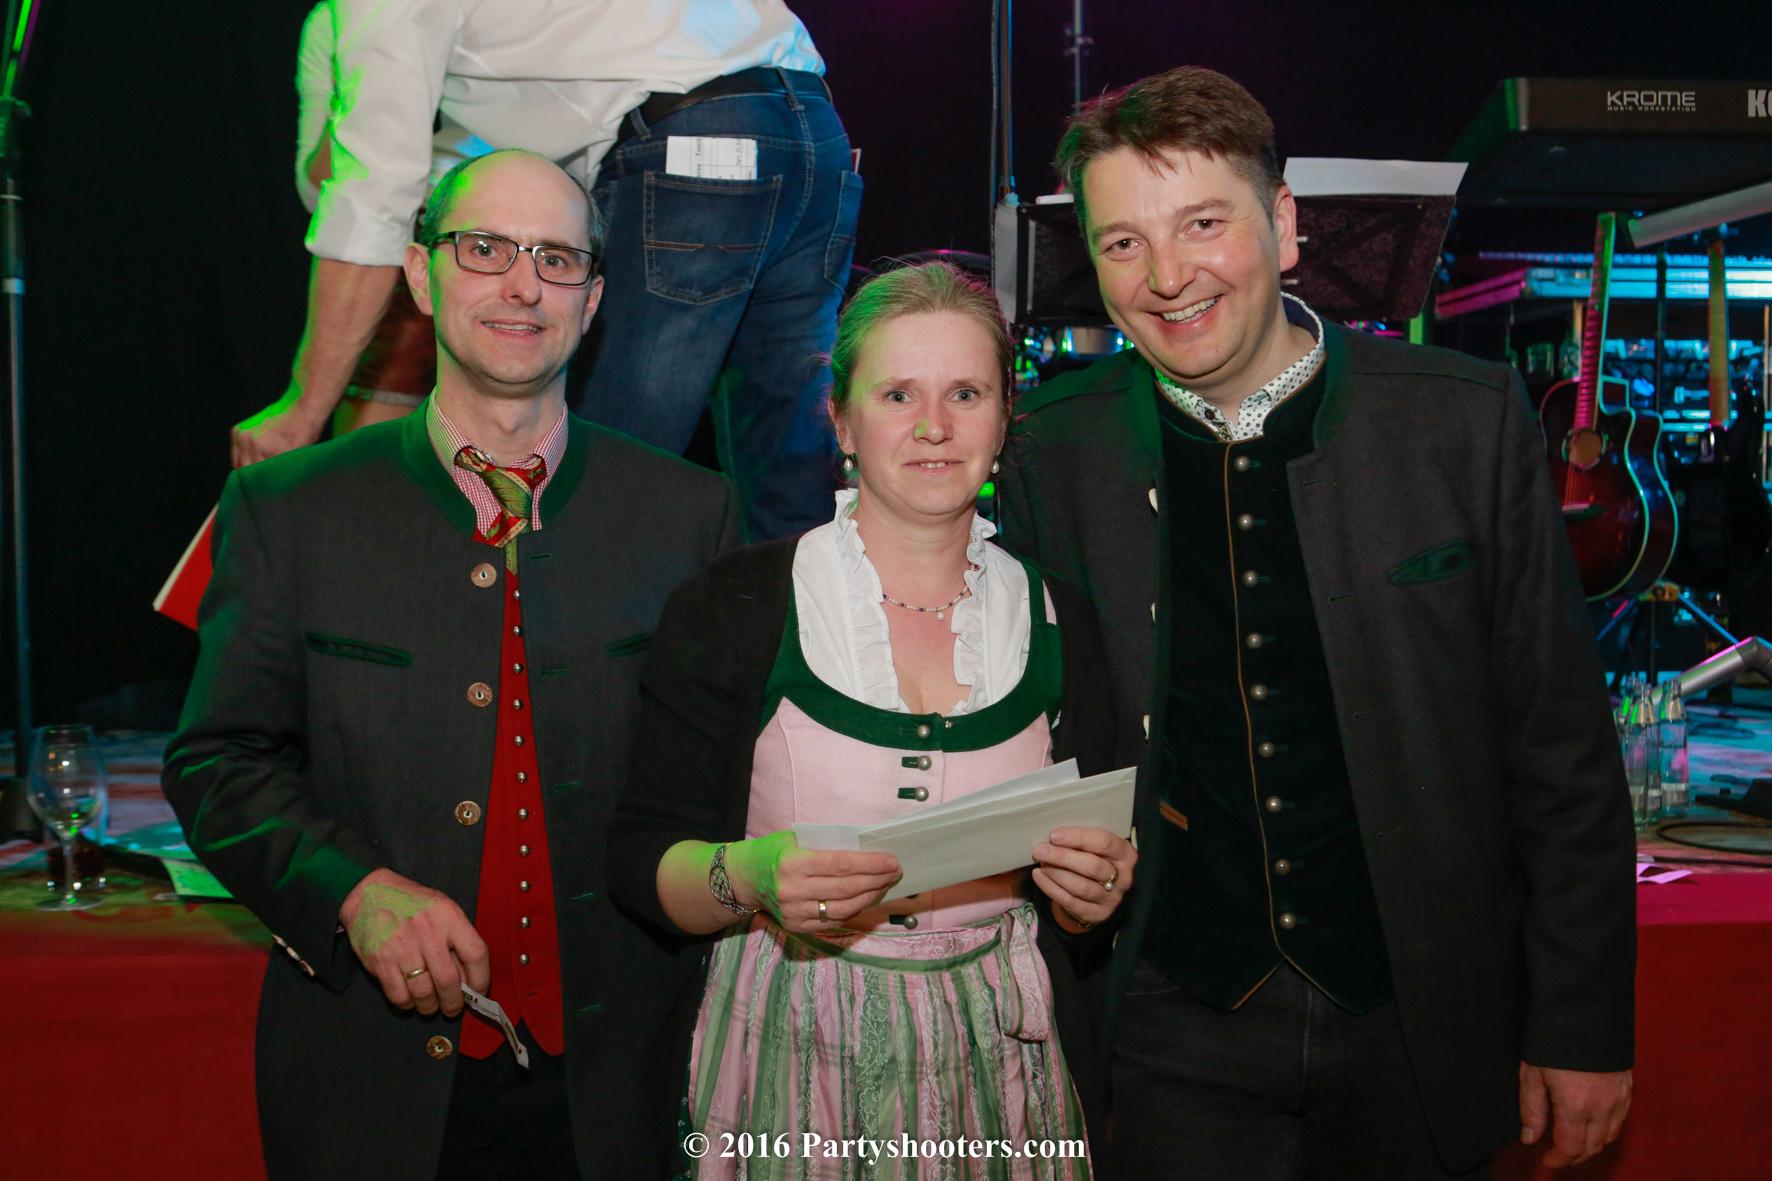 0103 - 4167 - Fruehlingsball Aspach